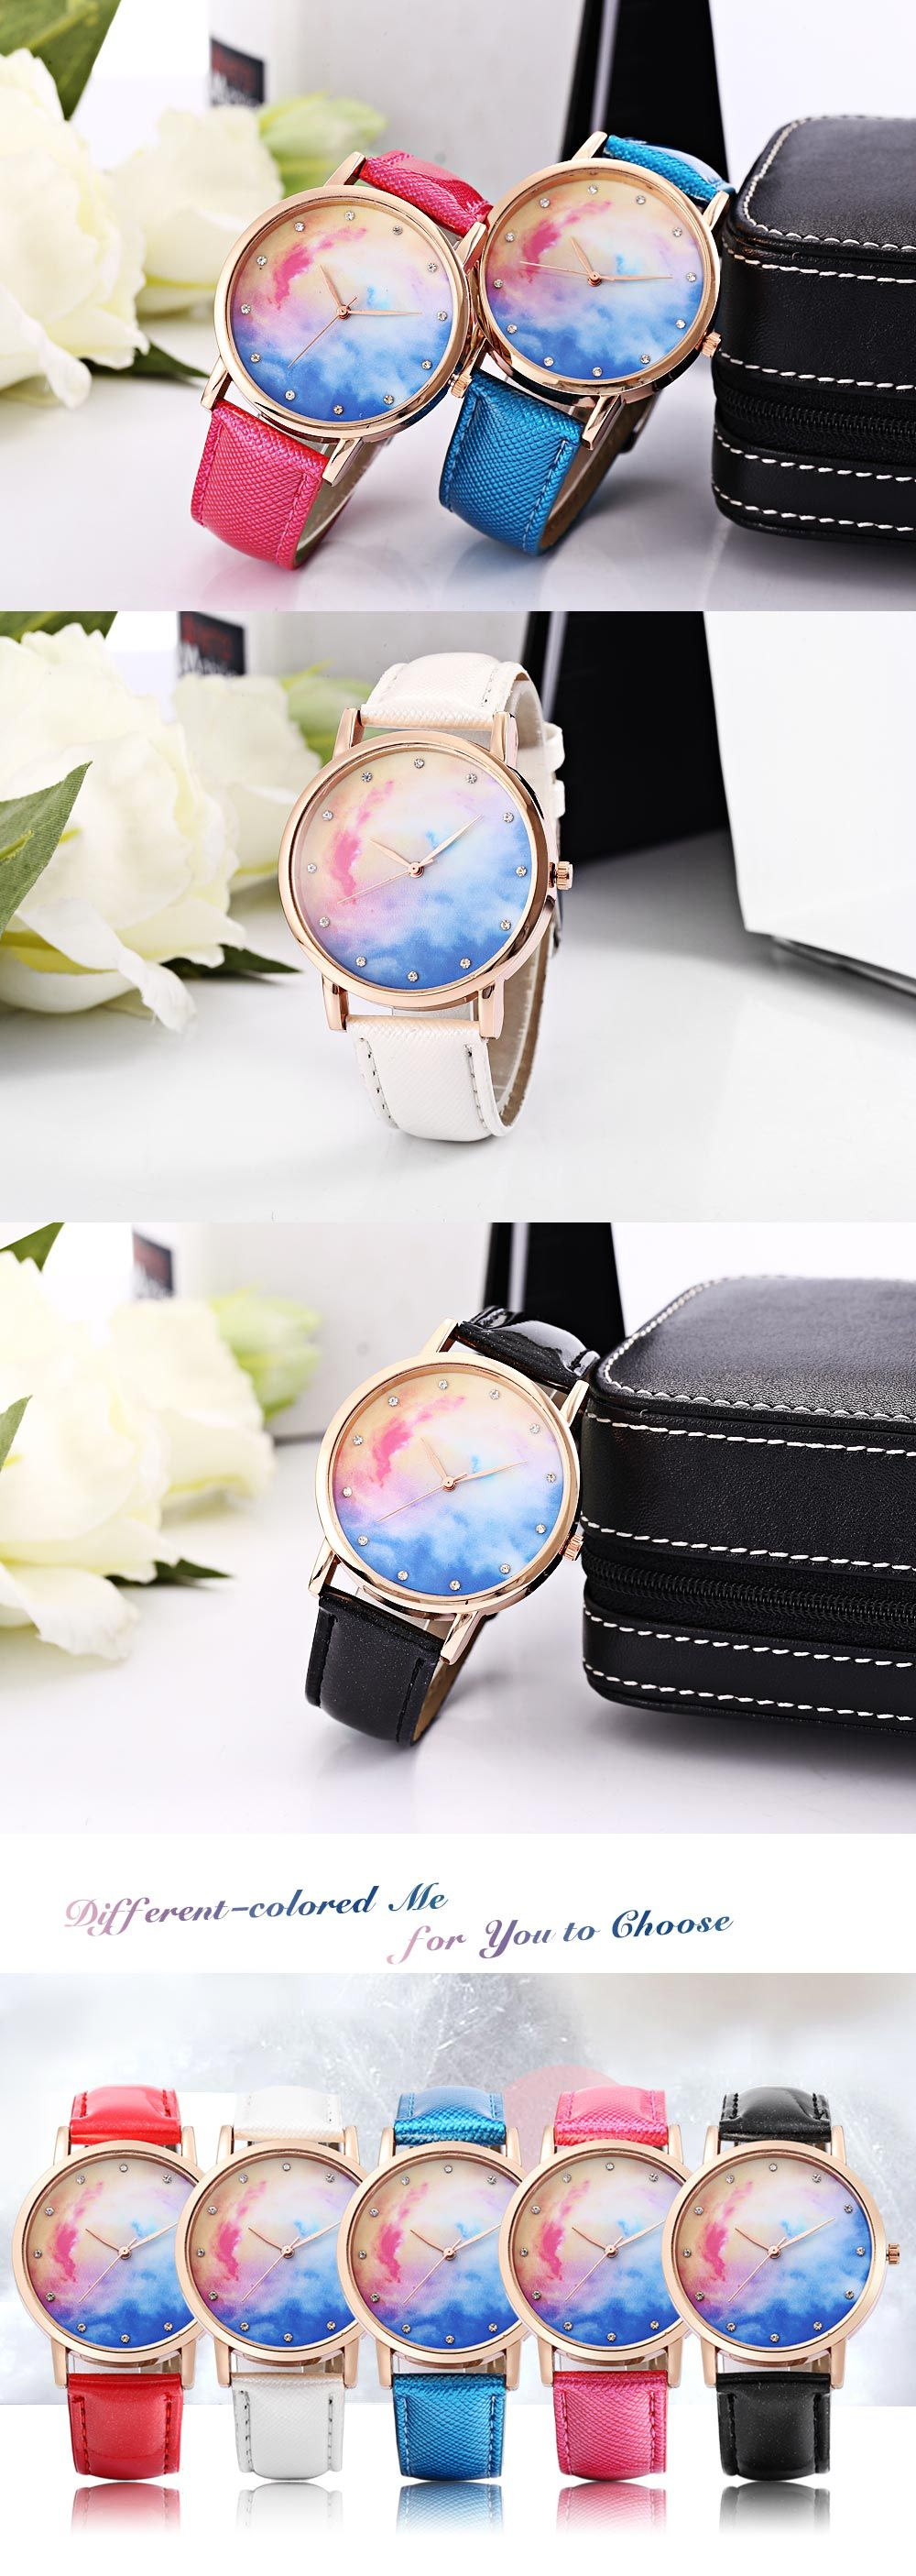 Fashion Female Quartz Watch Leather Band Artificial Diamond Starry Sky Pattern Dial Wristwatch